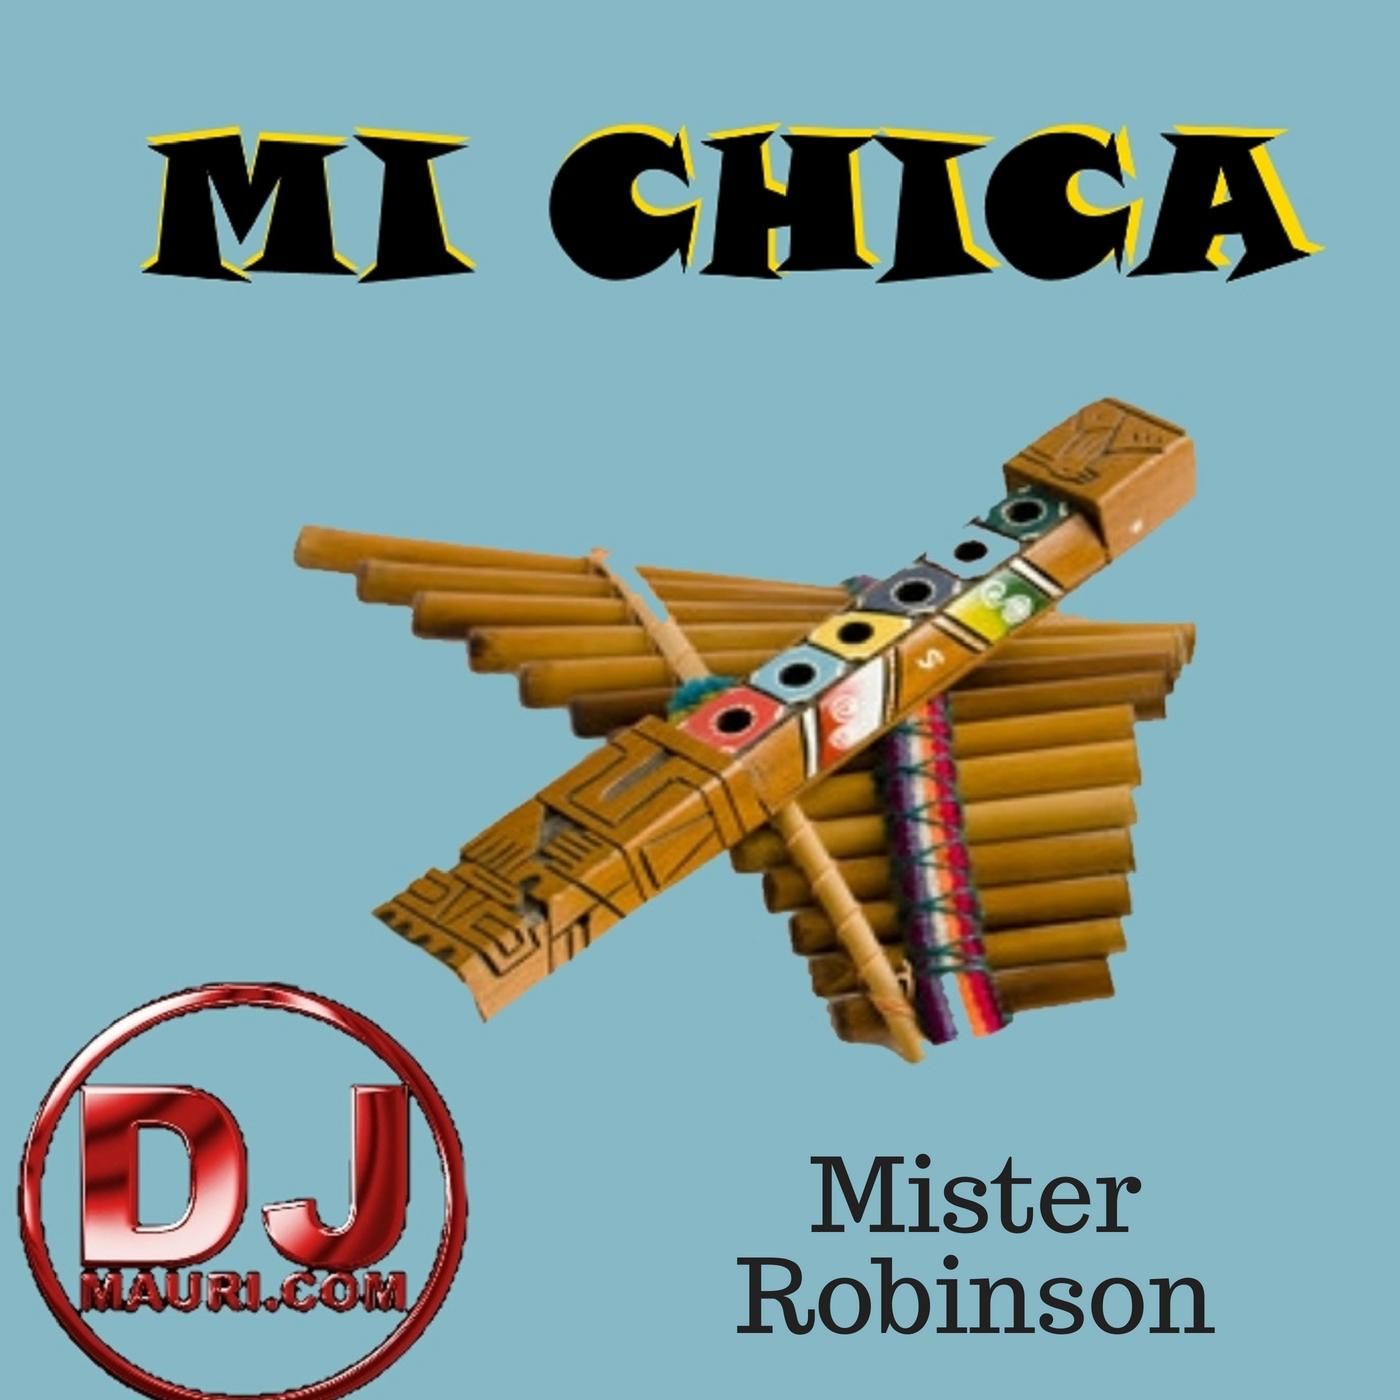 MI CHICA